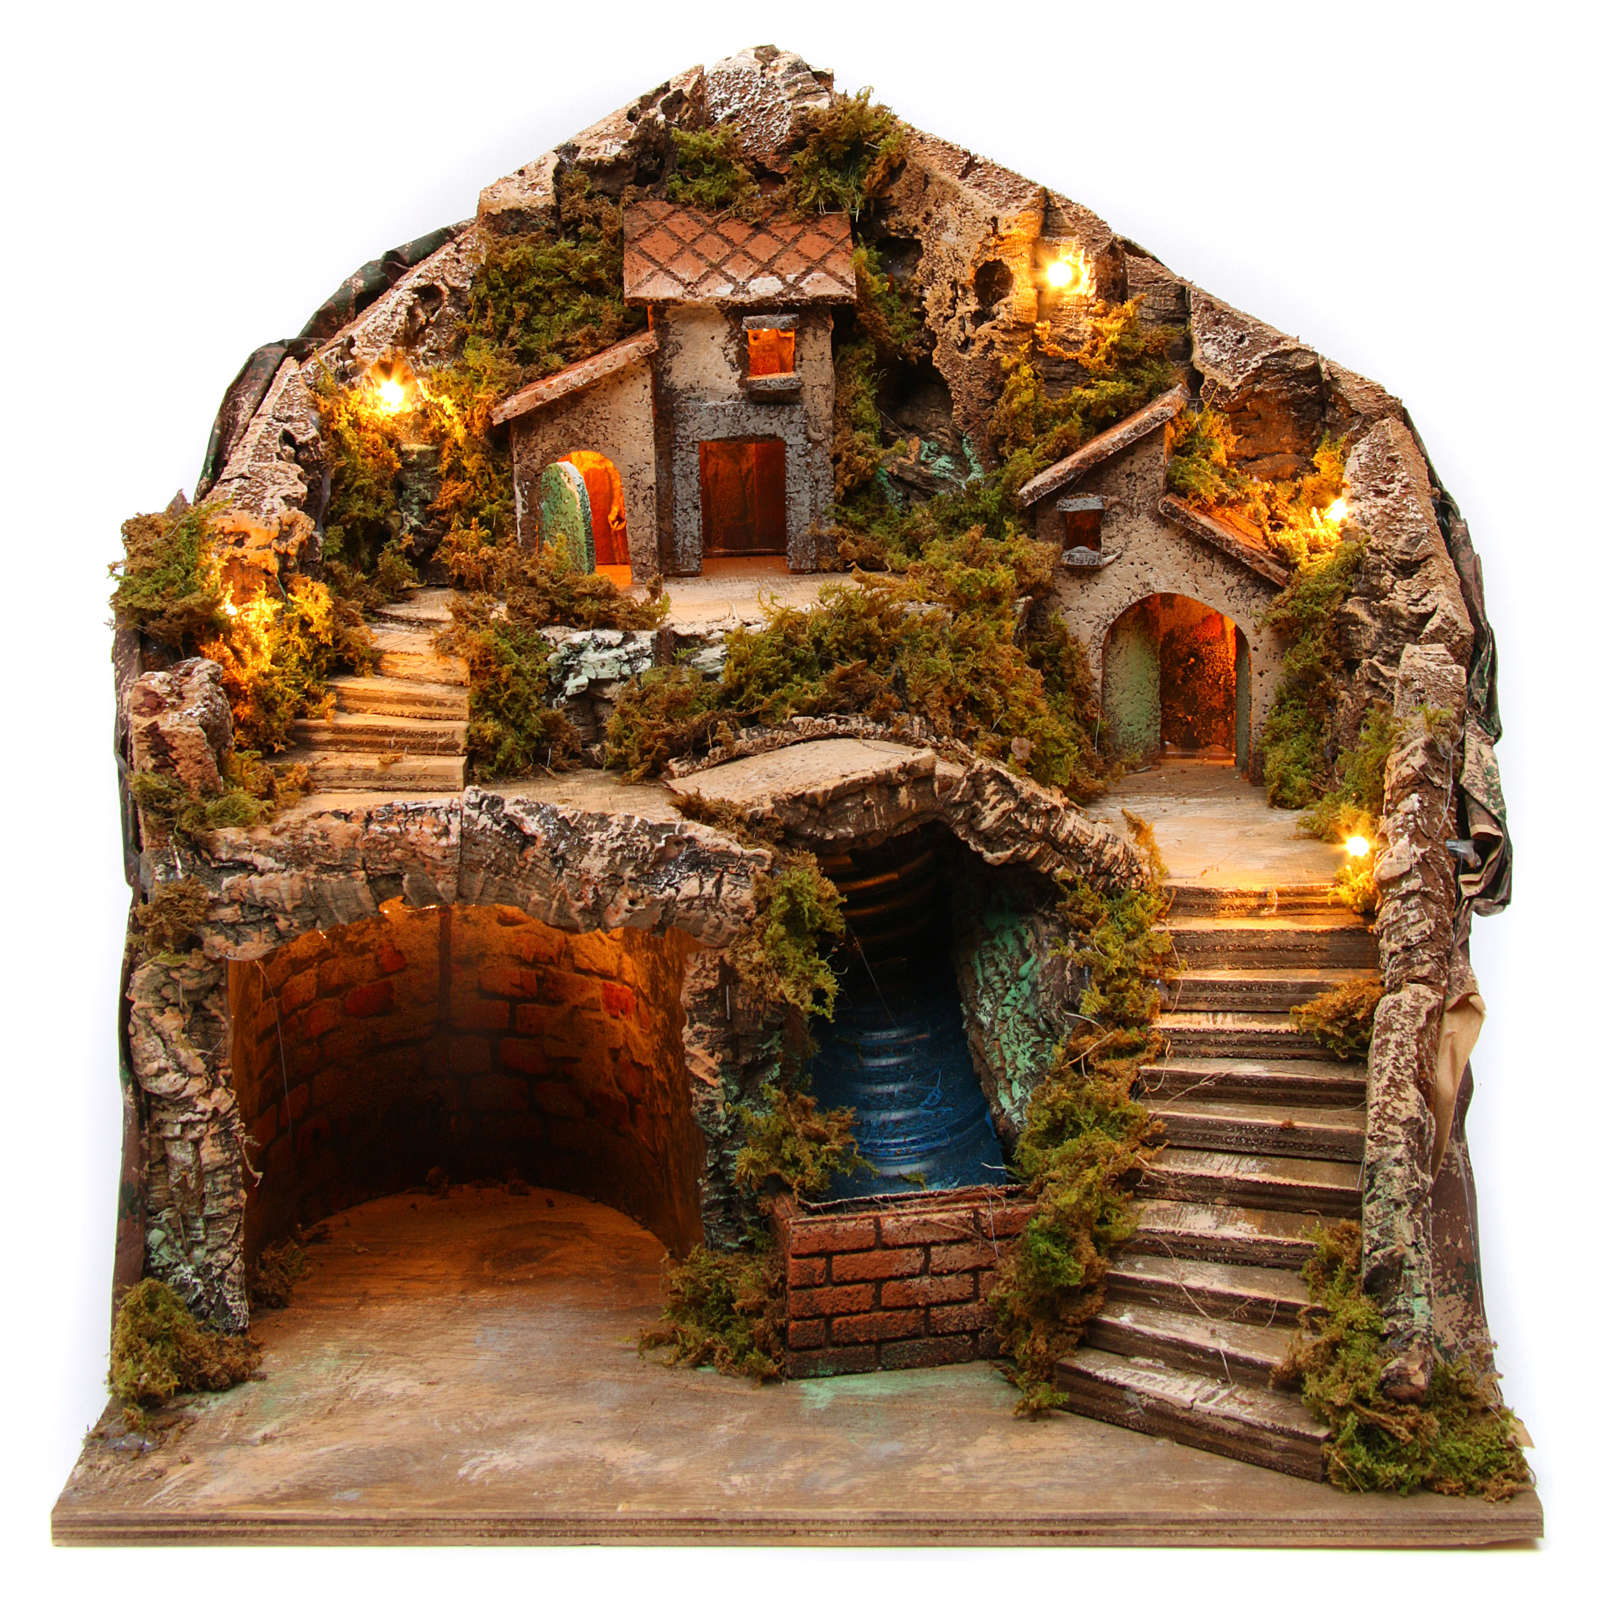 Village for Neapolitan Nativity scene with bridge and waterfall 35x40x30 cm 4